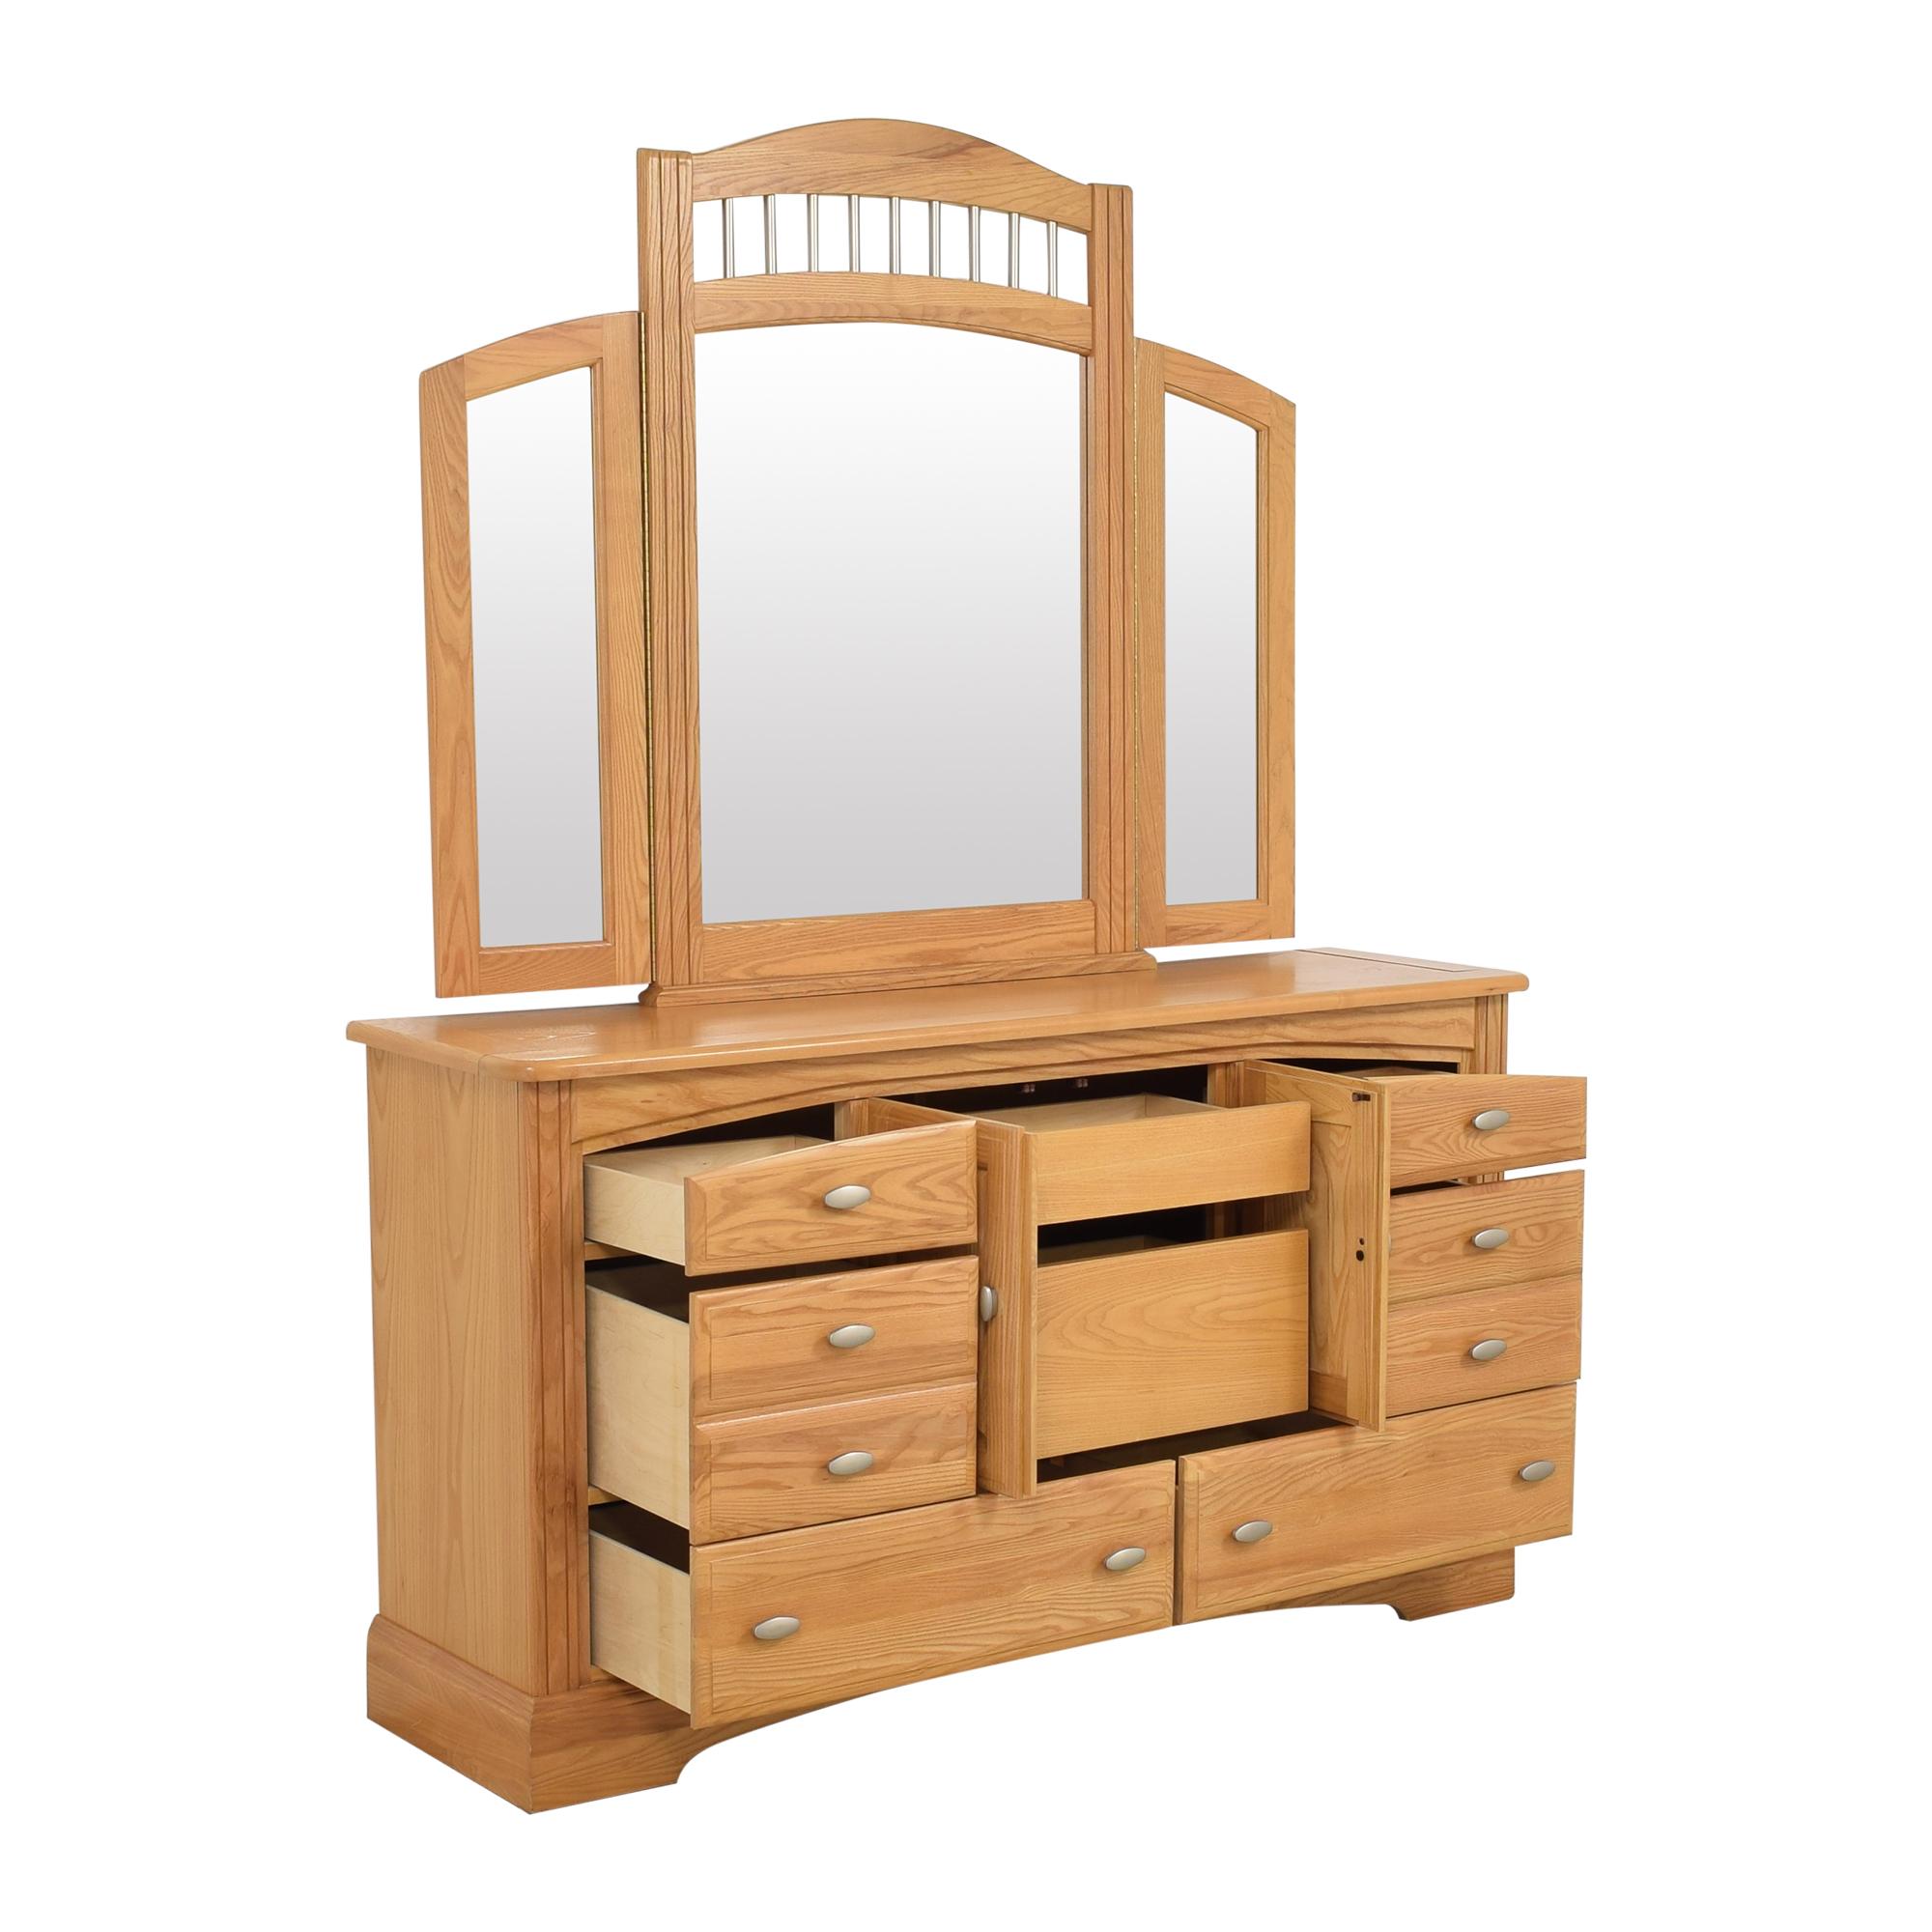 Kincaid Furniture Kincaid Dresser with Mirror Dressers